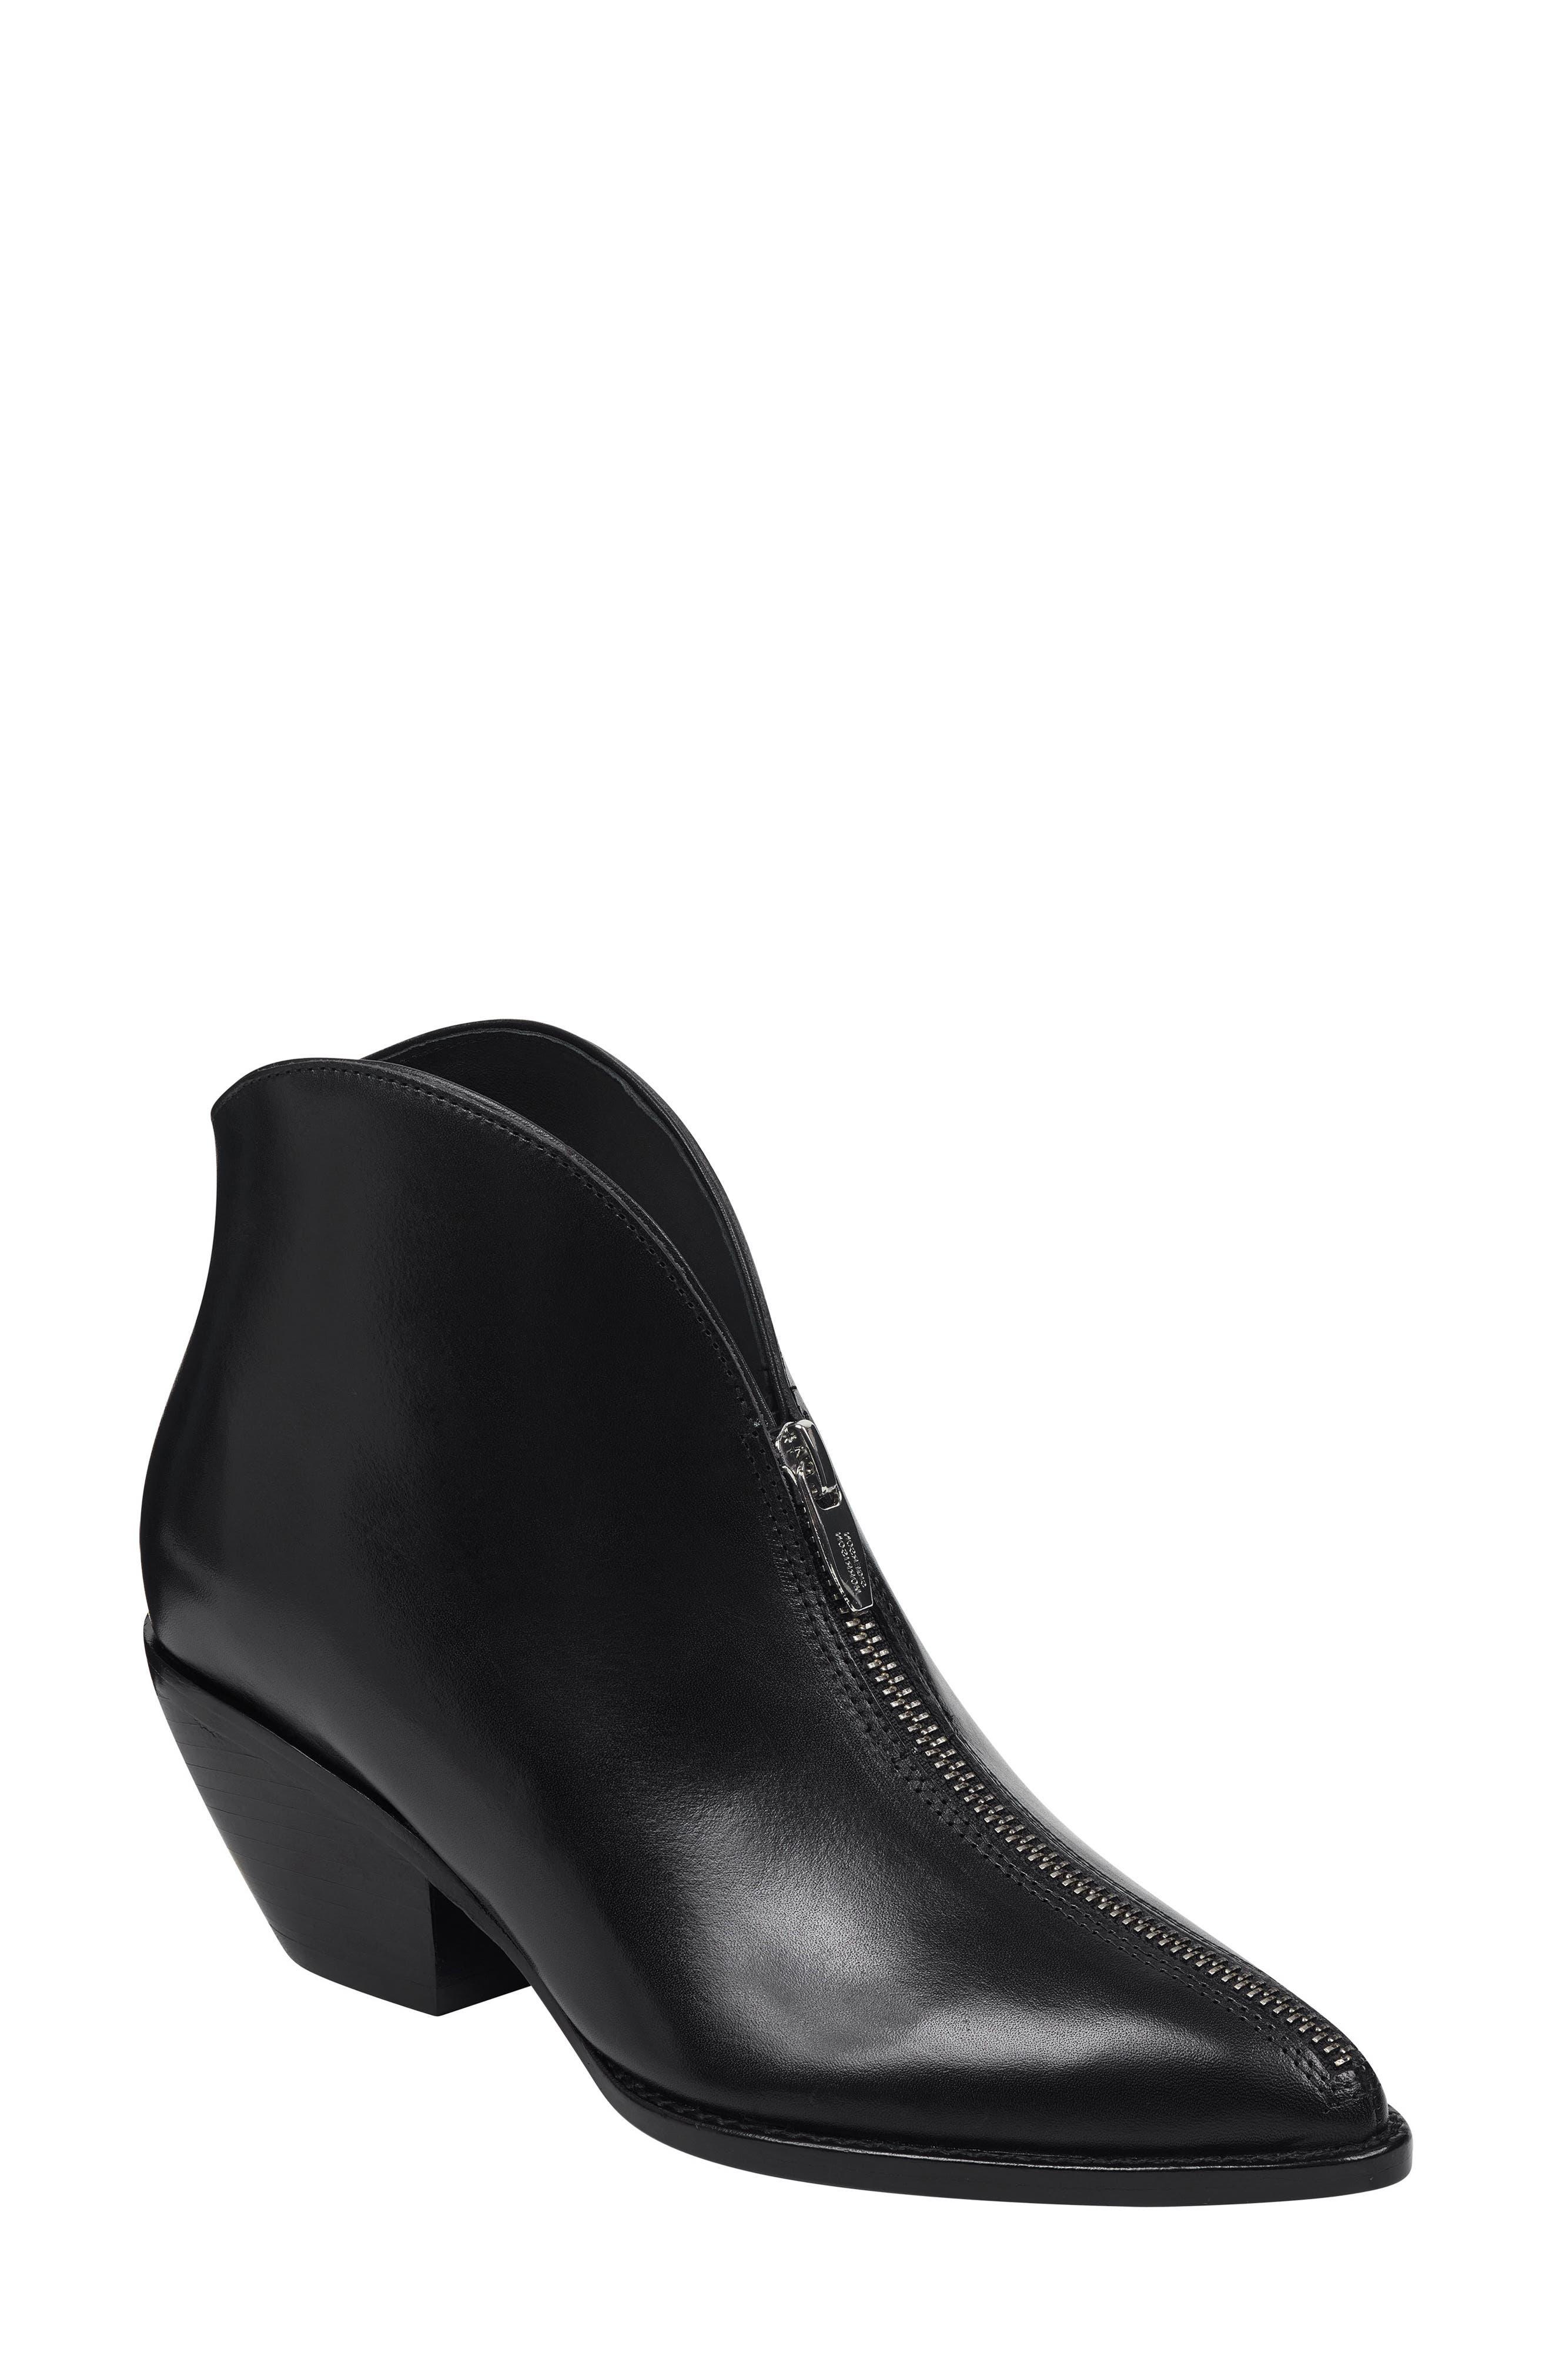 27fabc519da Women's Sigerson Morrison Booties & Ankle Boots | Nordstrom